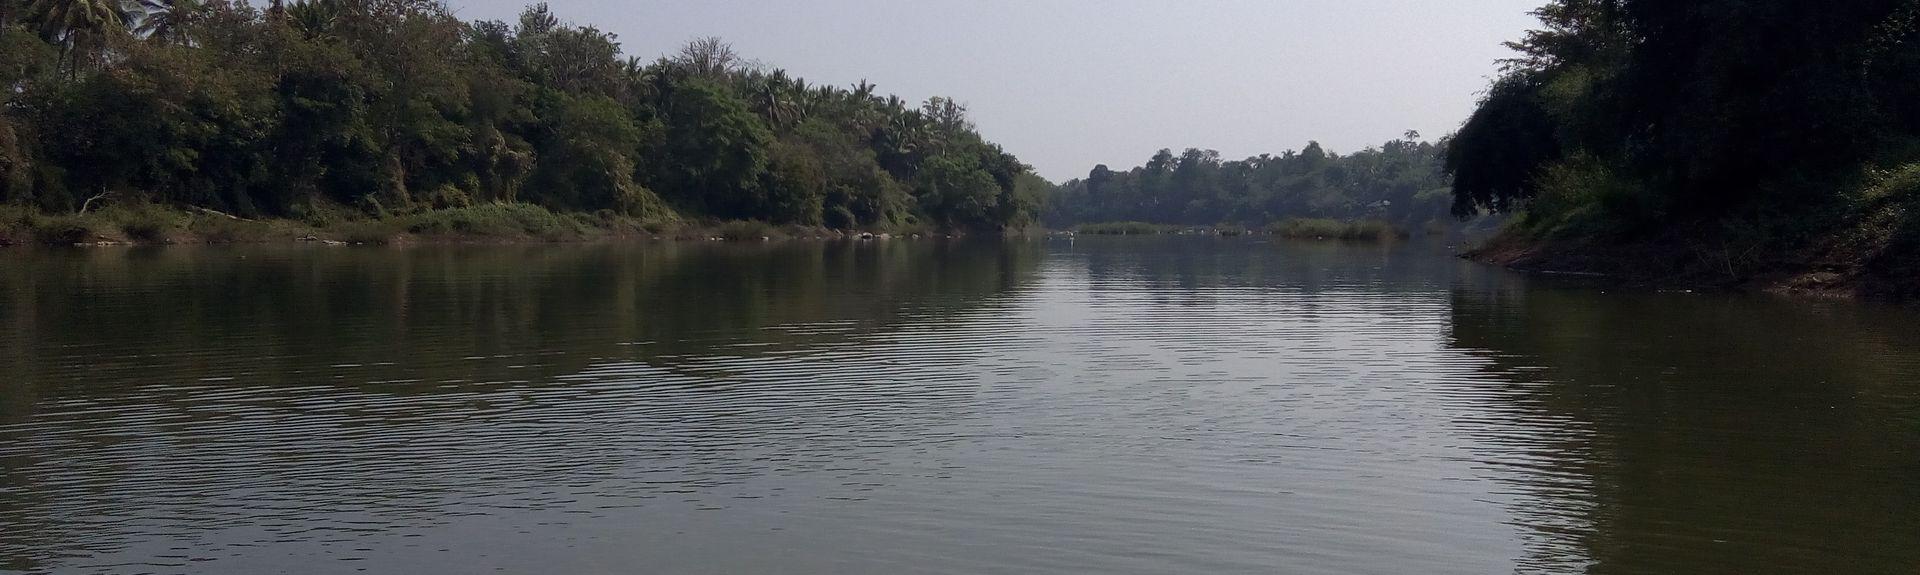 Wayanad District, Kerala, India